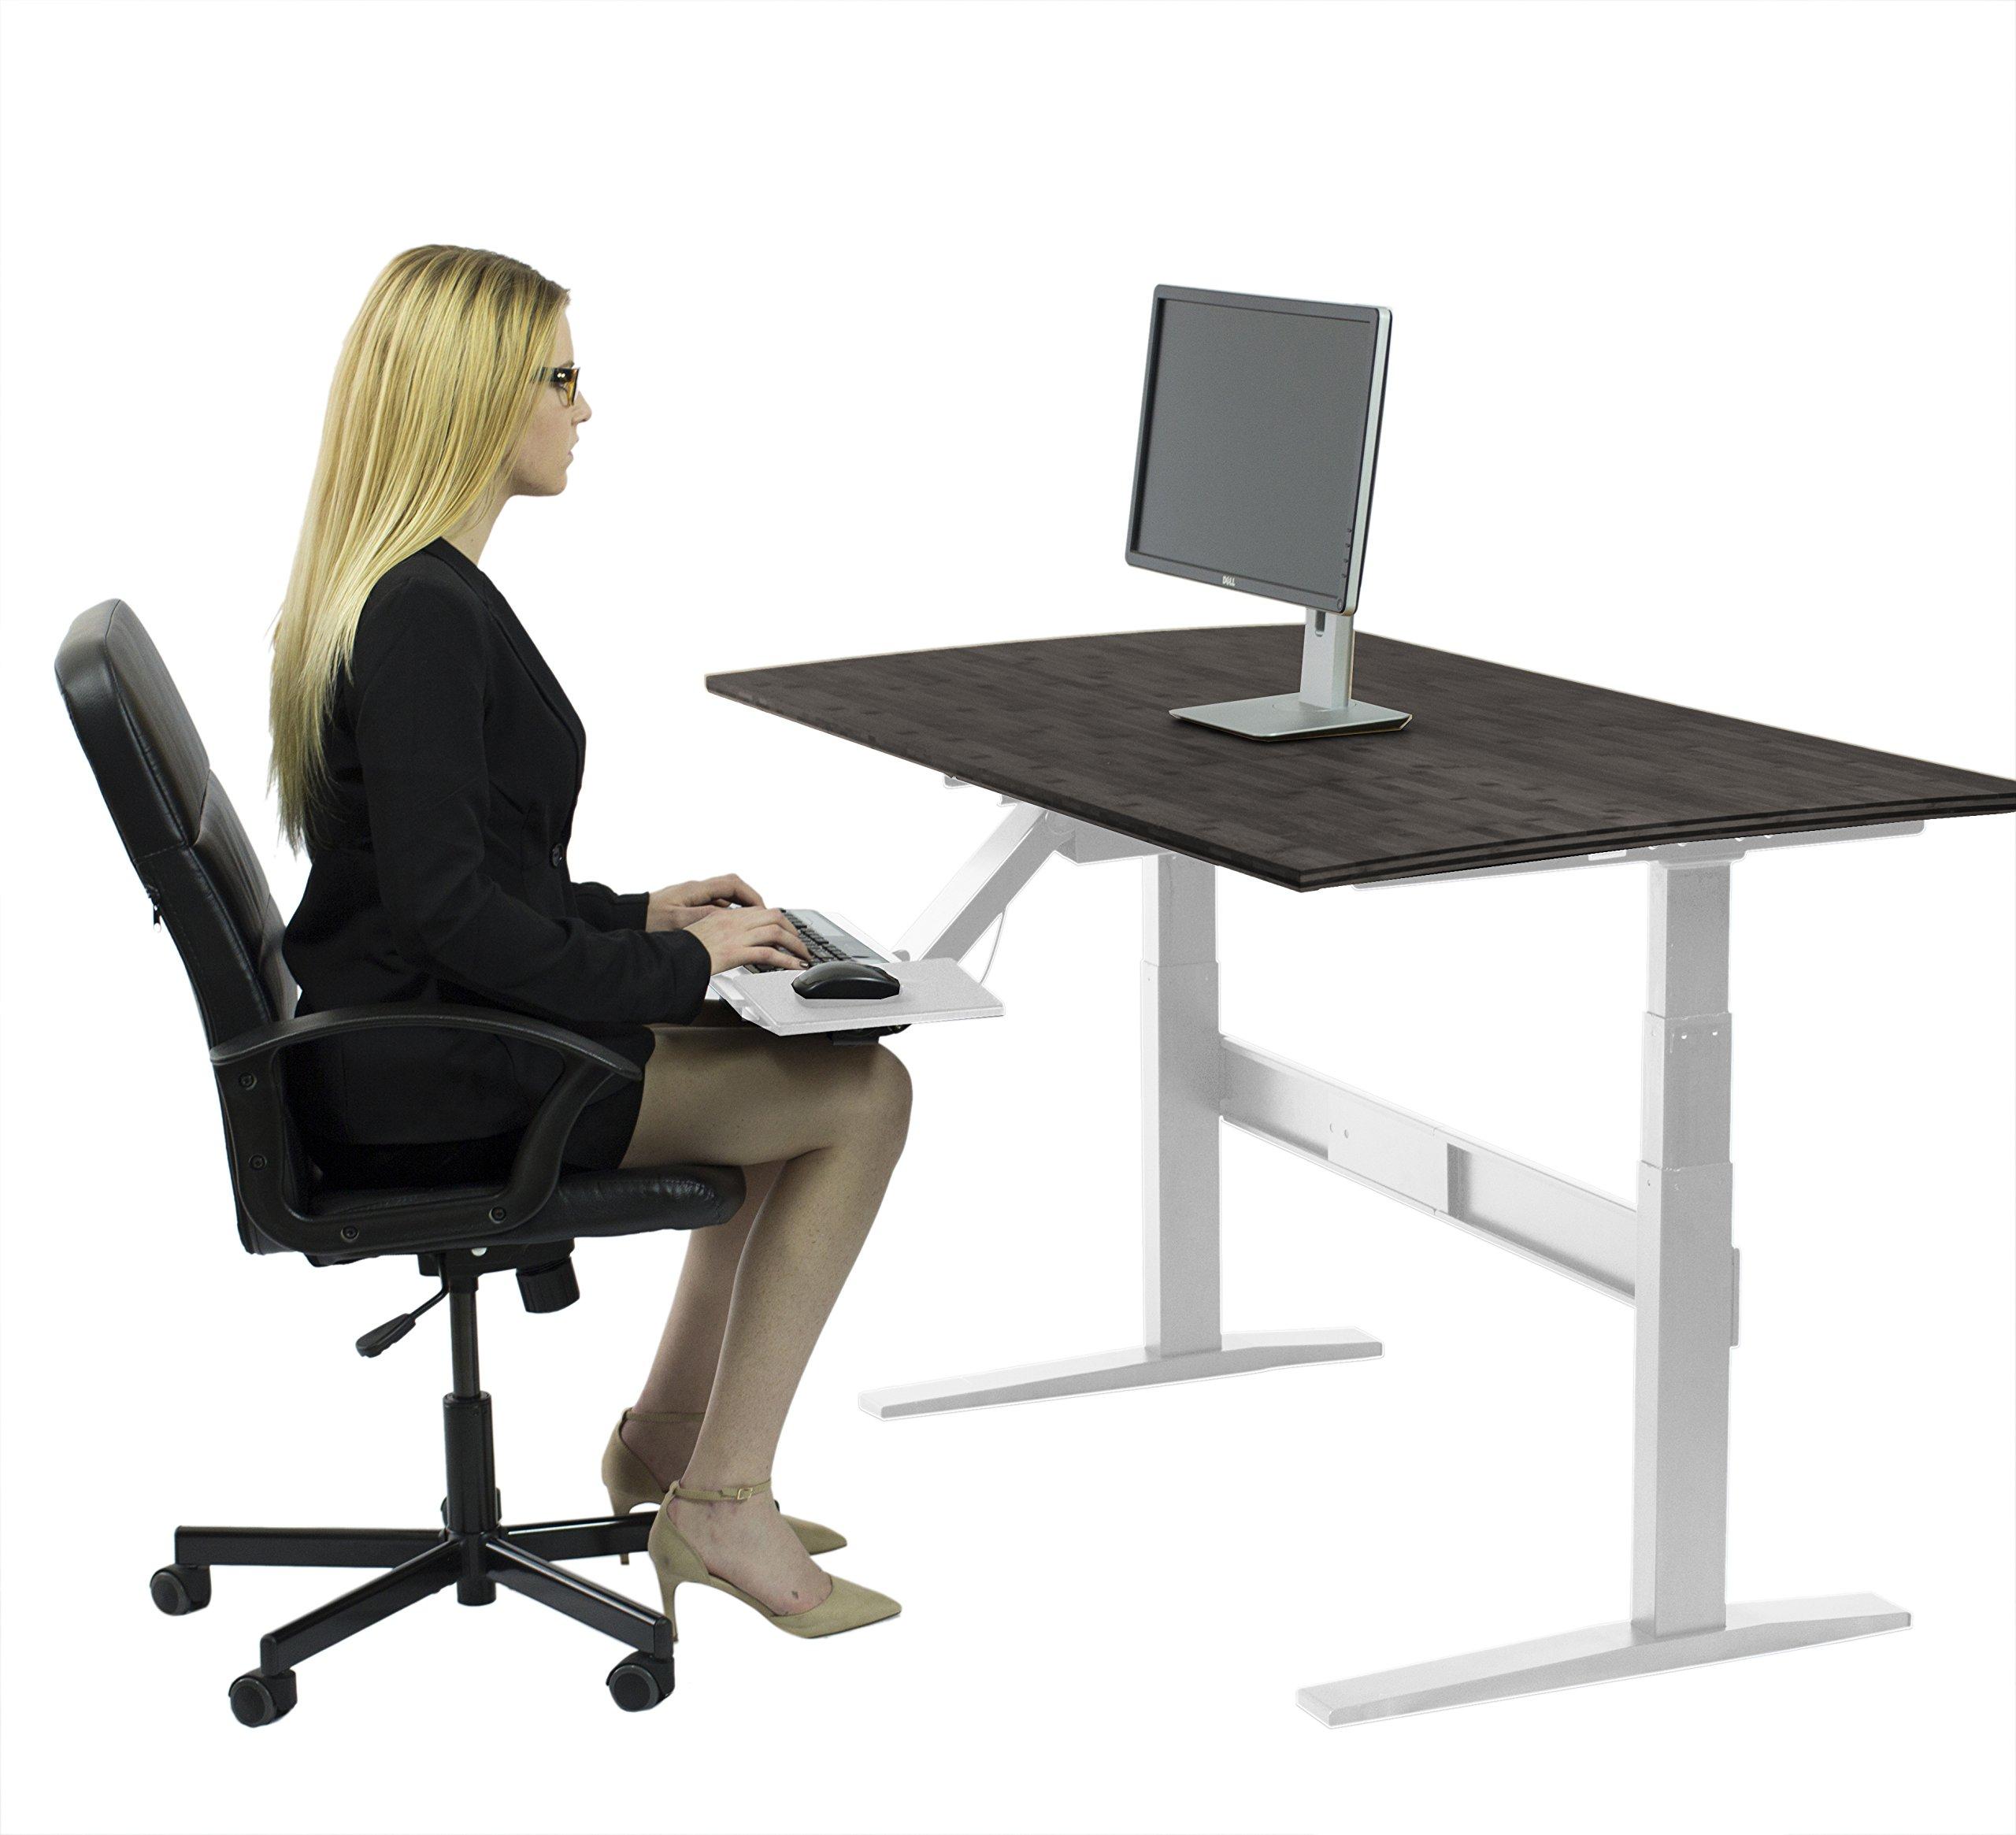 RISE UP Electric Adjustable Height Standing Desk + Beautiful Black Bamboo Desktop| Memory Keypad| 2 Motors| Affordable Ergonomic Sit Stand Office Desk by Uncaged Ergonomics (Image #4)